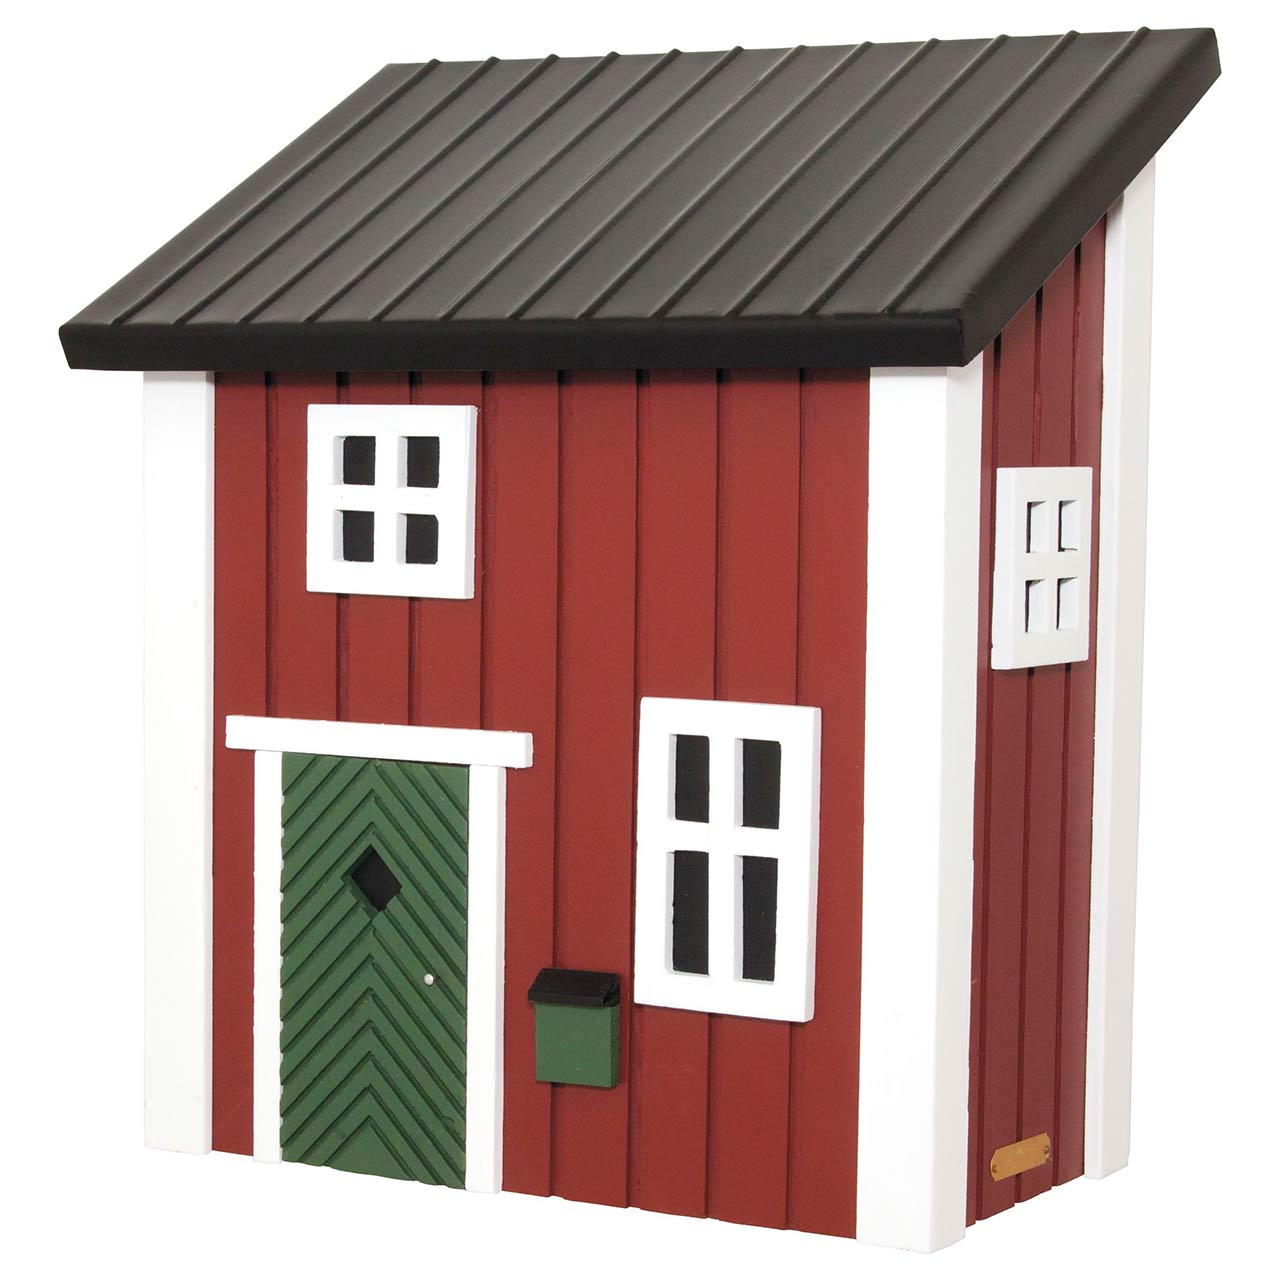 WILDLIFE GARDEN Letterbox Red Mail Cottage | the design gift shop